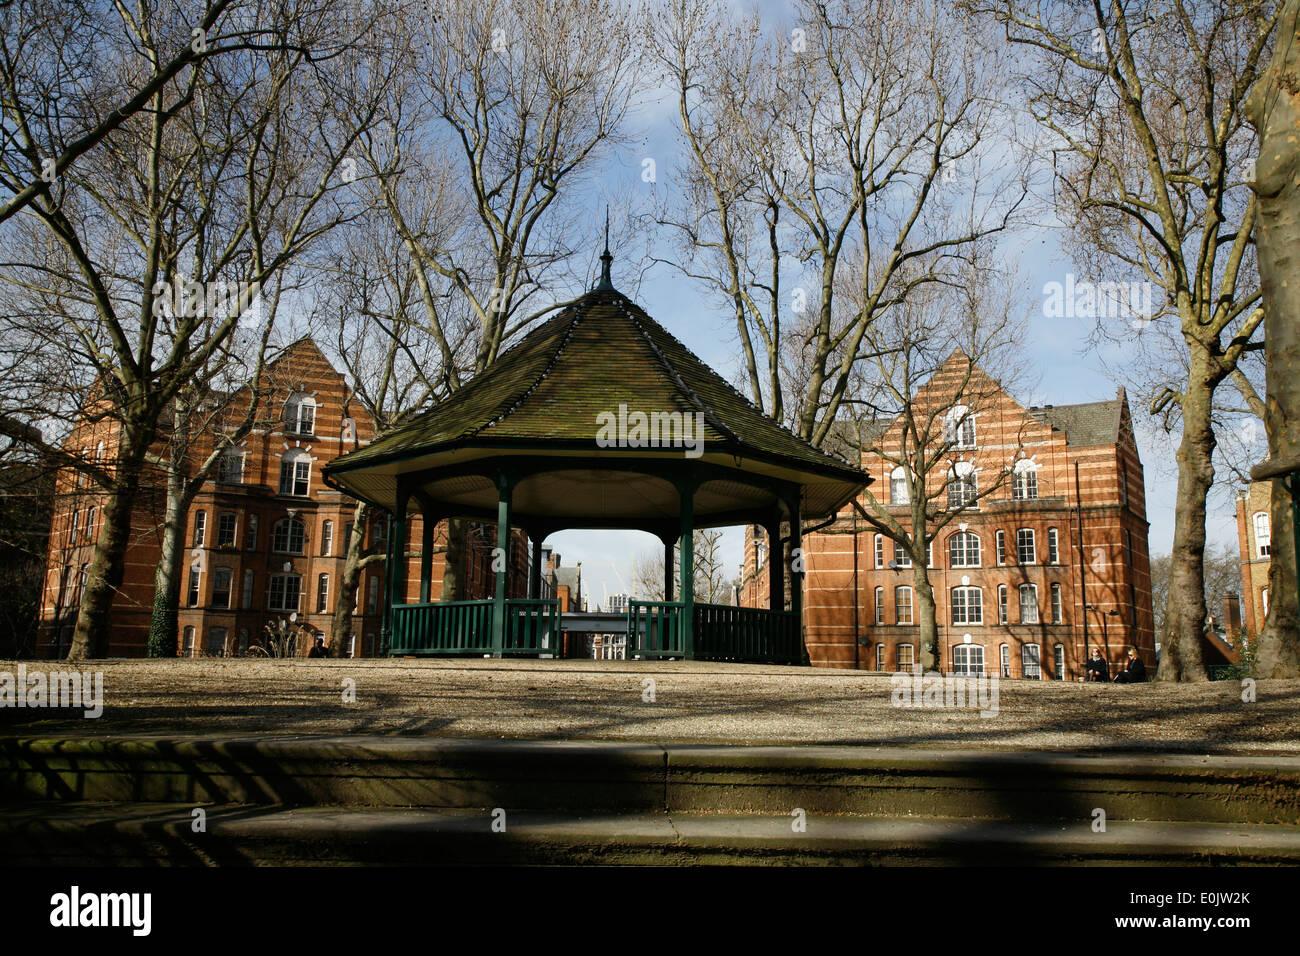 Boundary Gardens in Arnold Circus, Shoreditch, London, UK - Stock Image